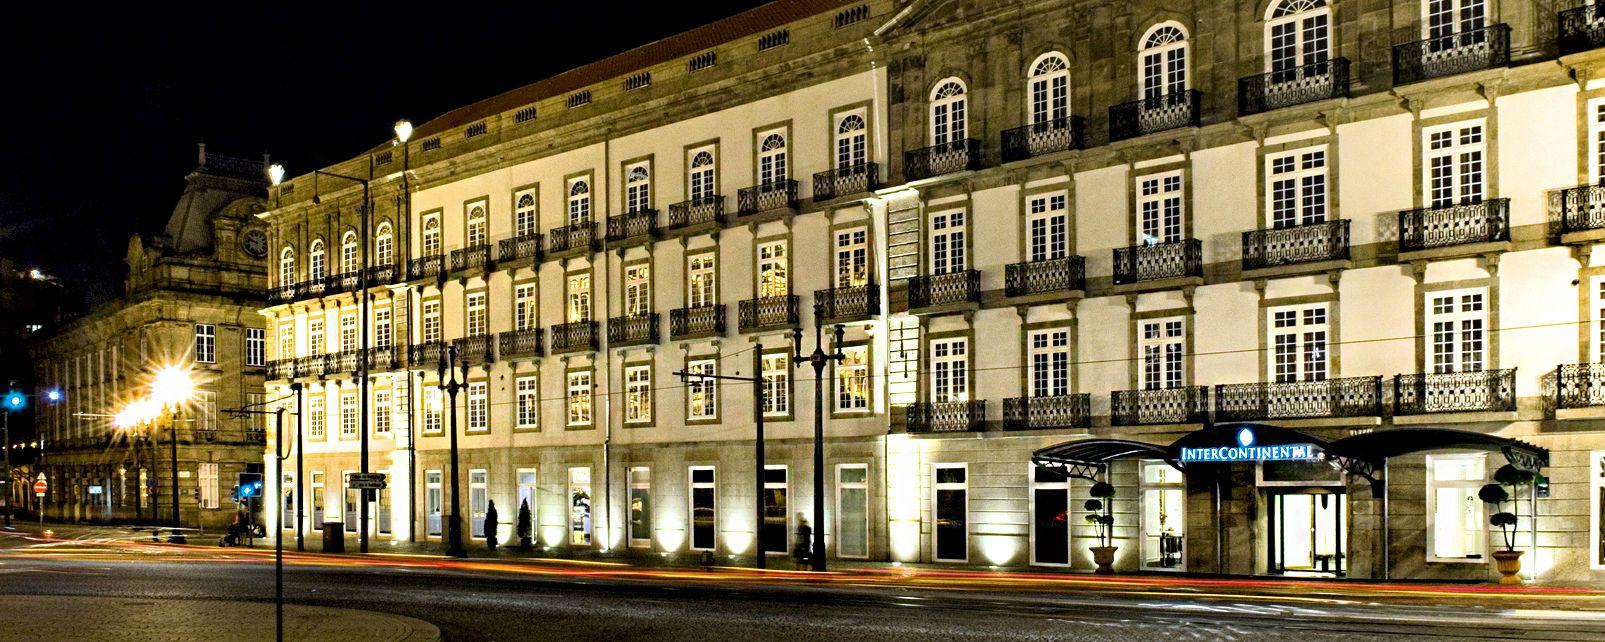 Hôtel InterContinental Porto Palacio das Cardosas